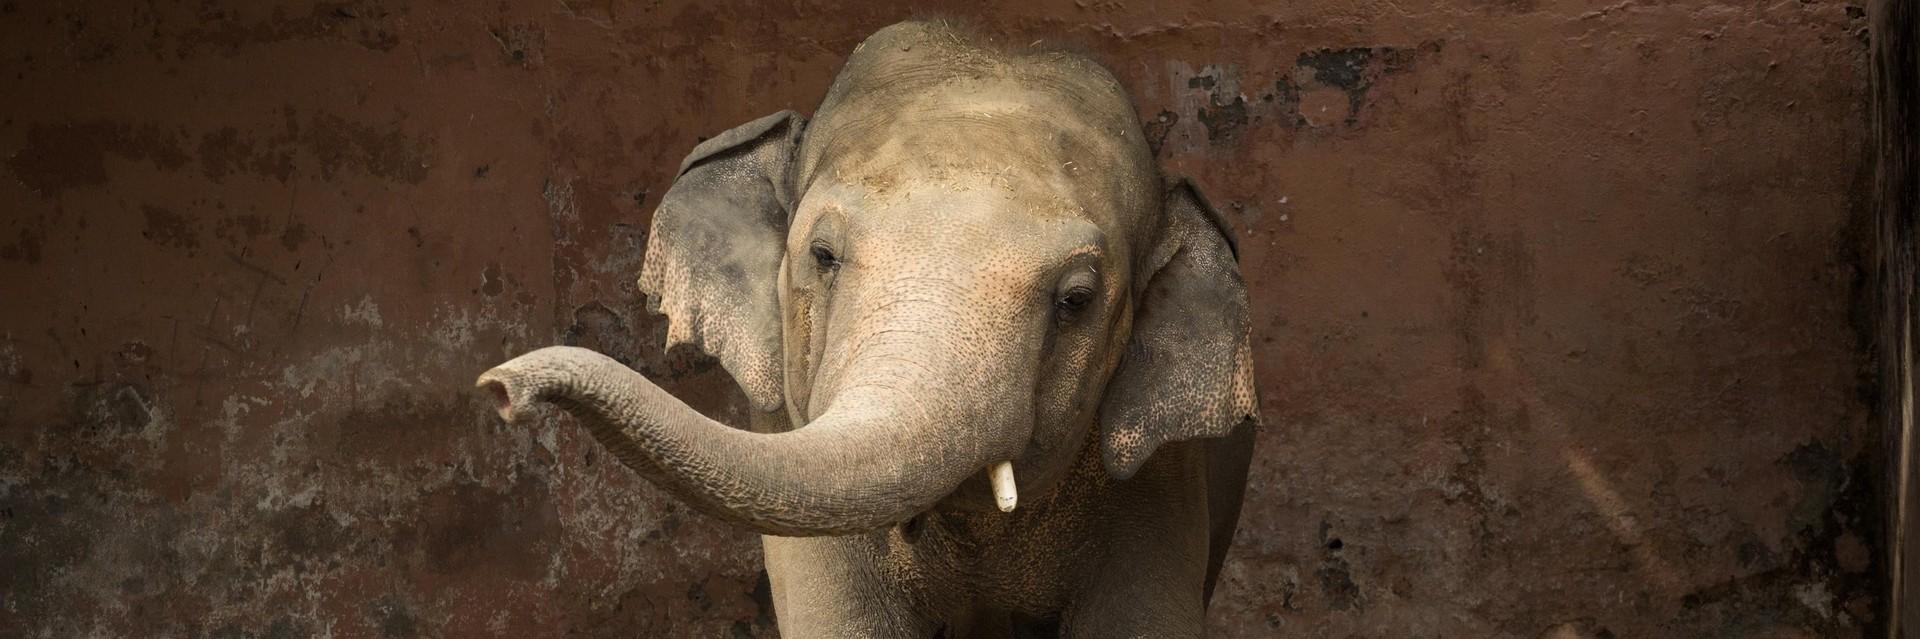 Kaavan im Zoo von Pakistan